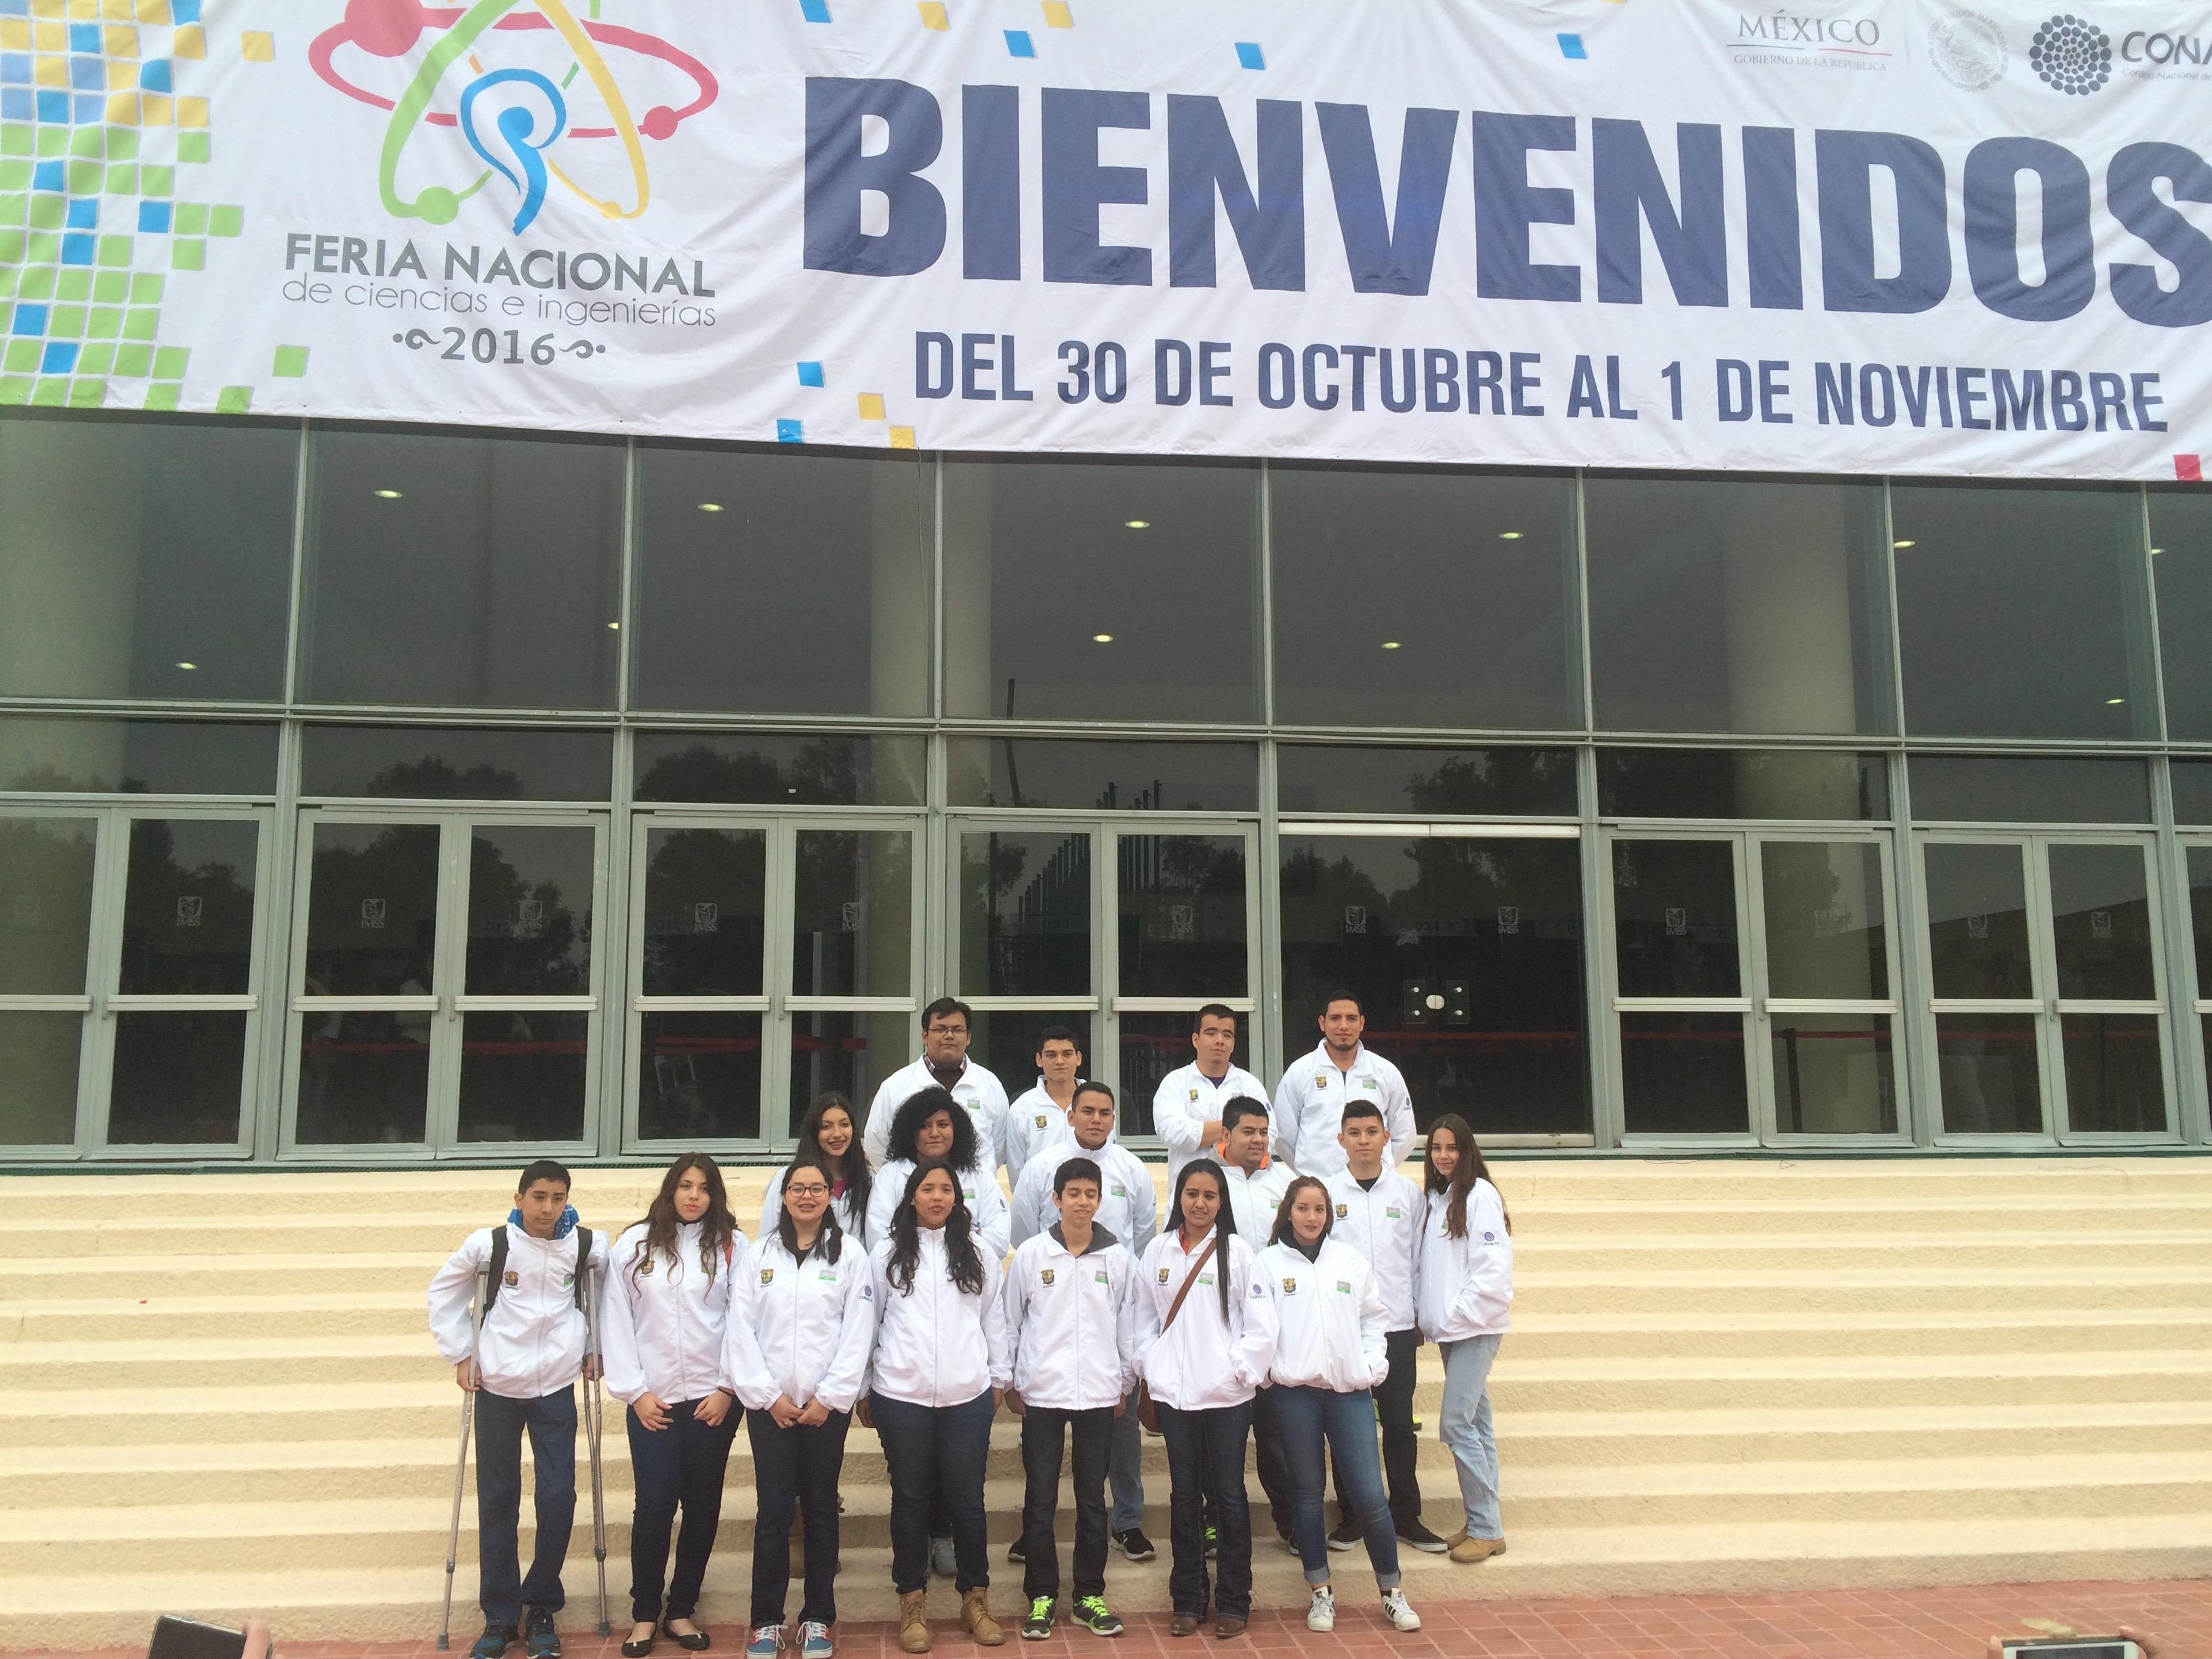 Alex_Najera,_Zyania_G._Sánchez_y_Ana_Paola_Mtz._en_FENACI_México,_D.F.